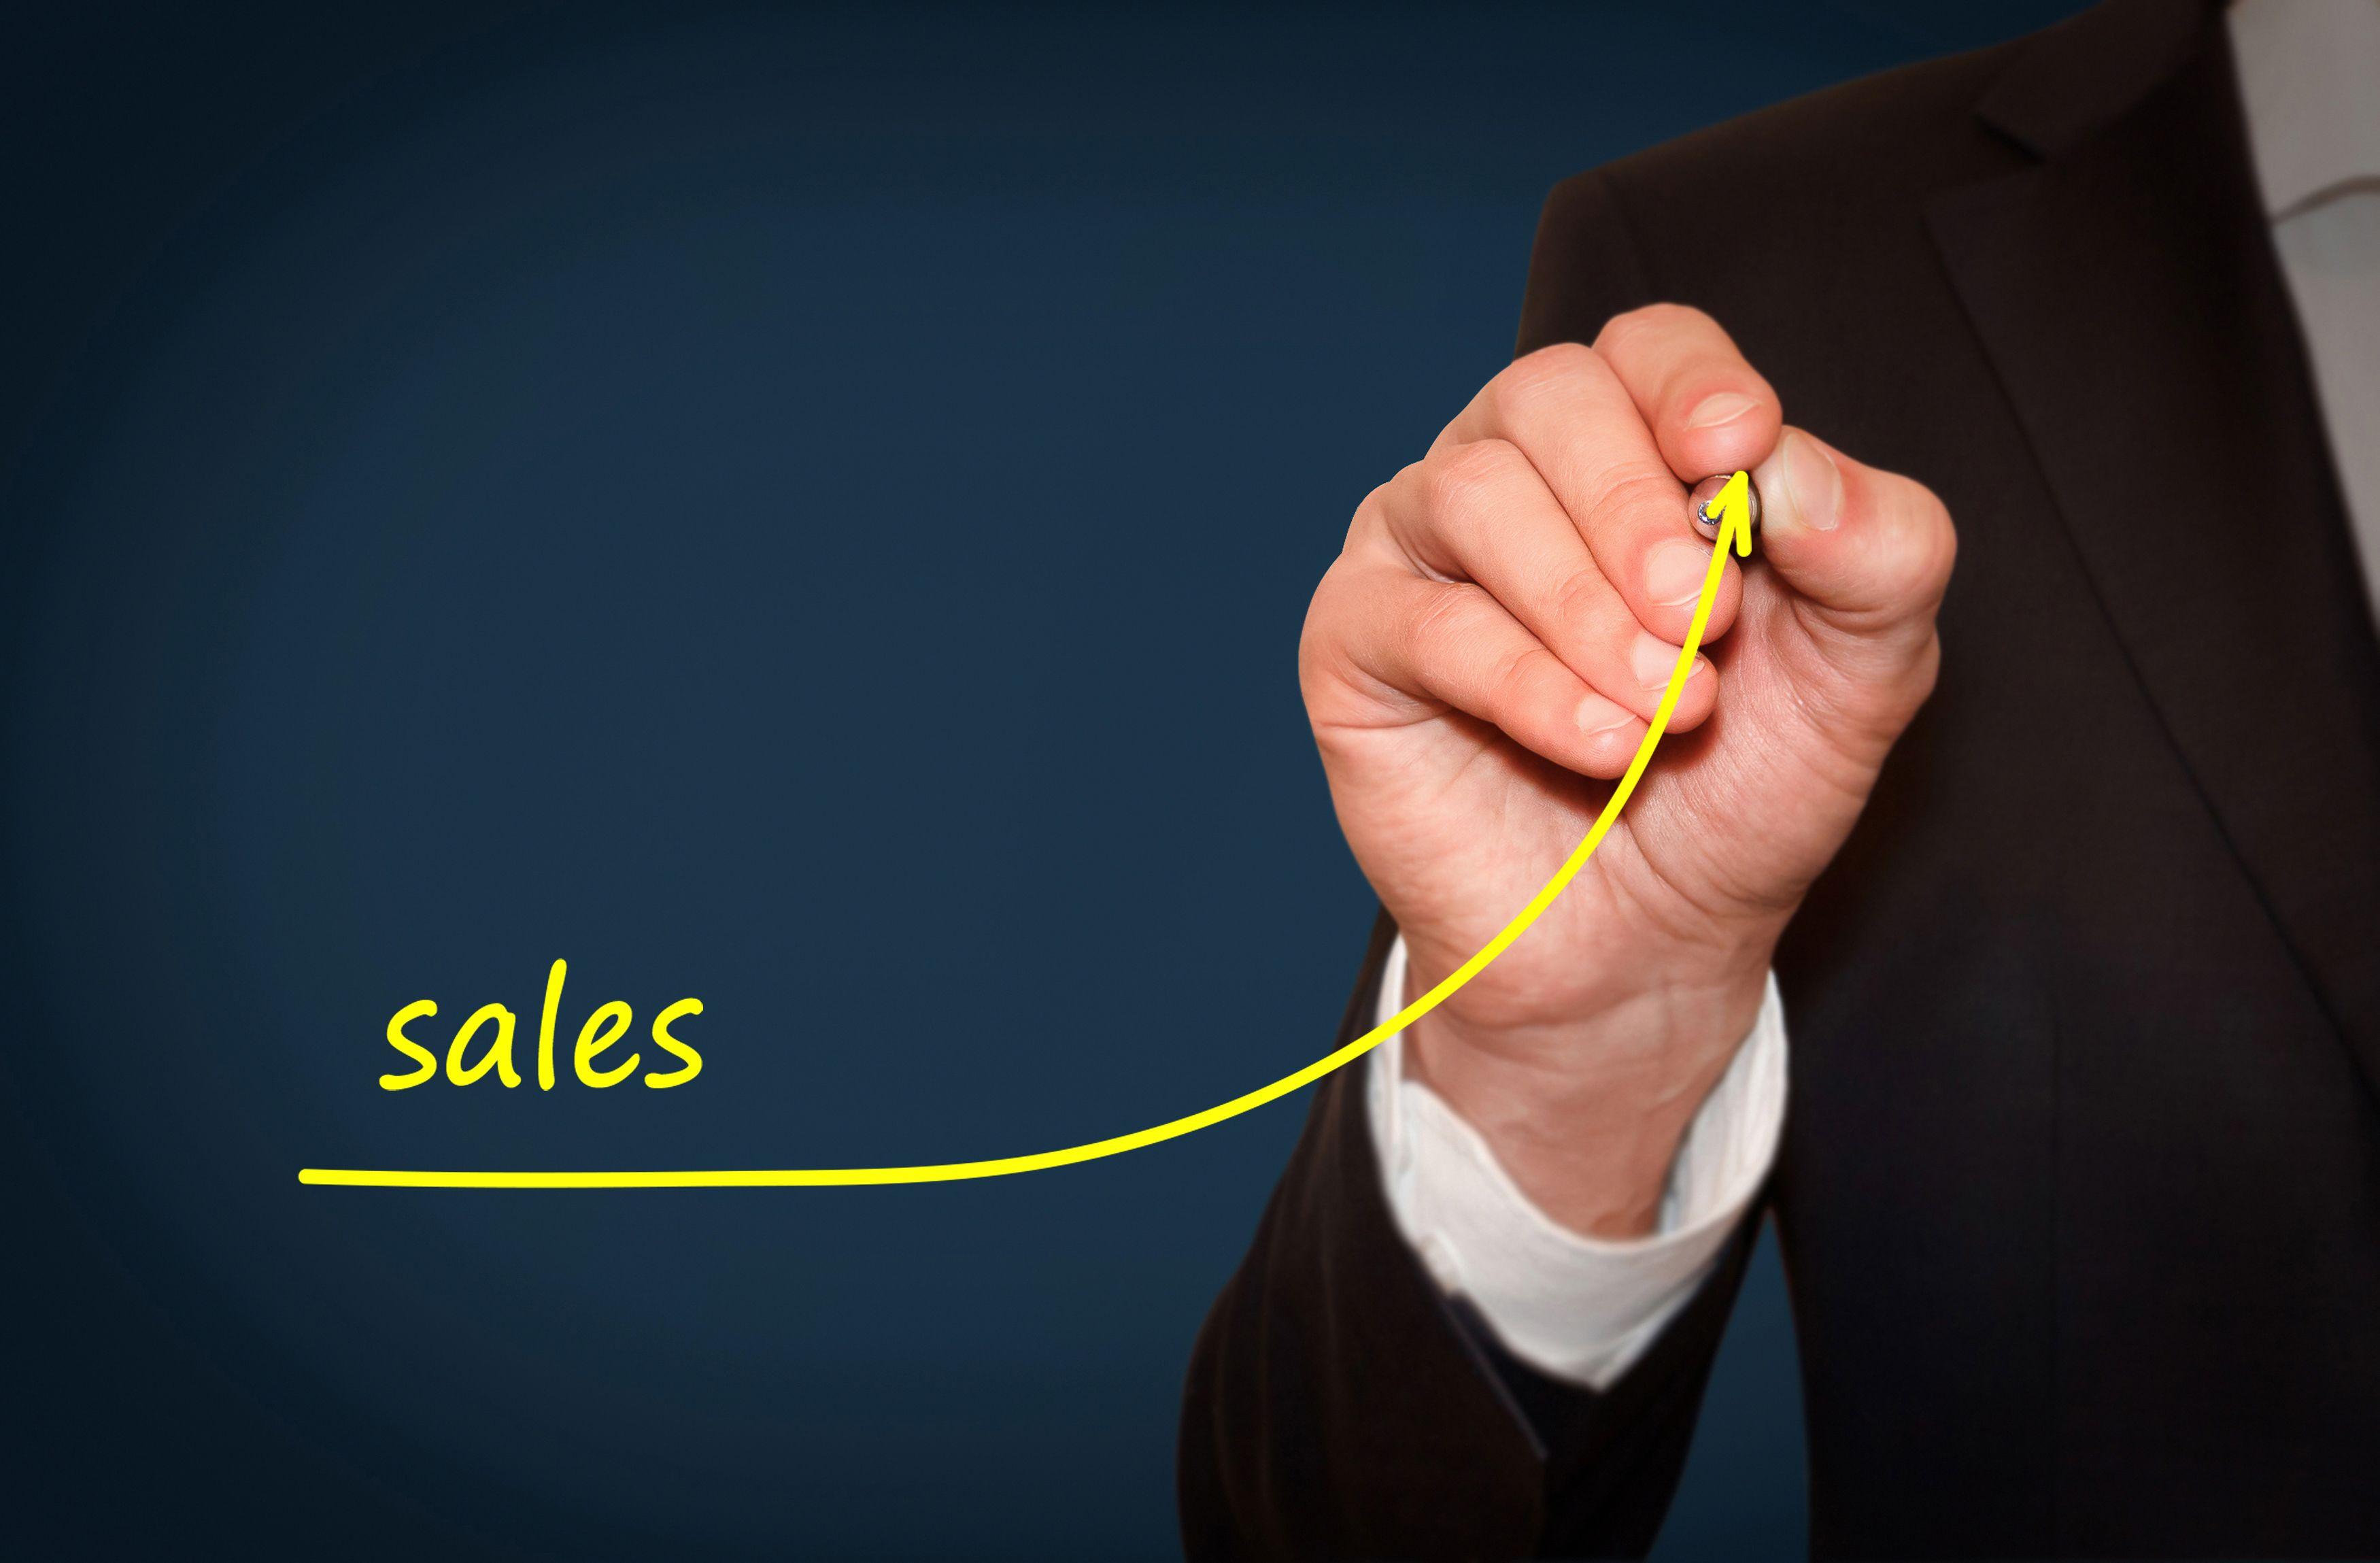 businessman-draw-growing-line-symbolize-growing-company-sales.jpg